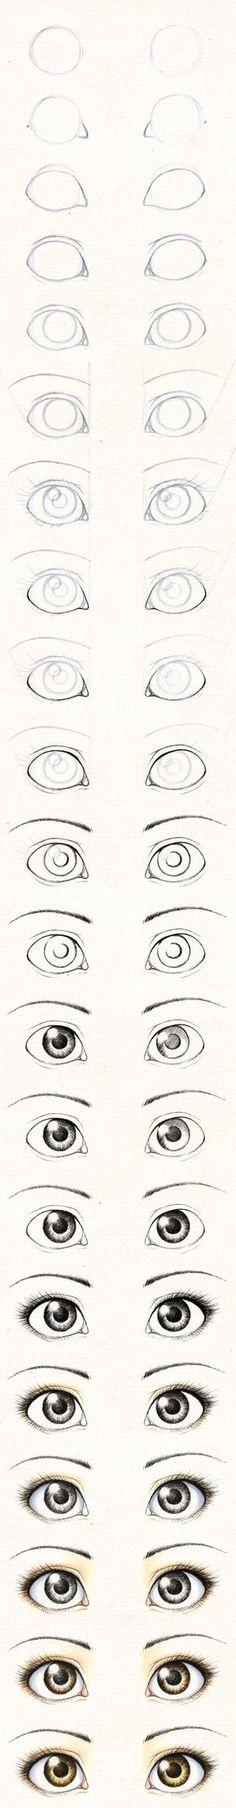 Рисуем глаза текстильной кукле / Tutorial: Draw eyes for textile doll #diy #painting #doll: